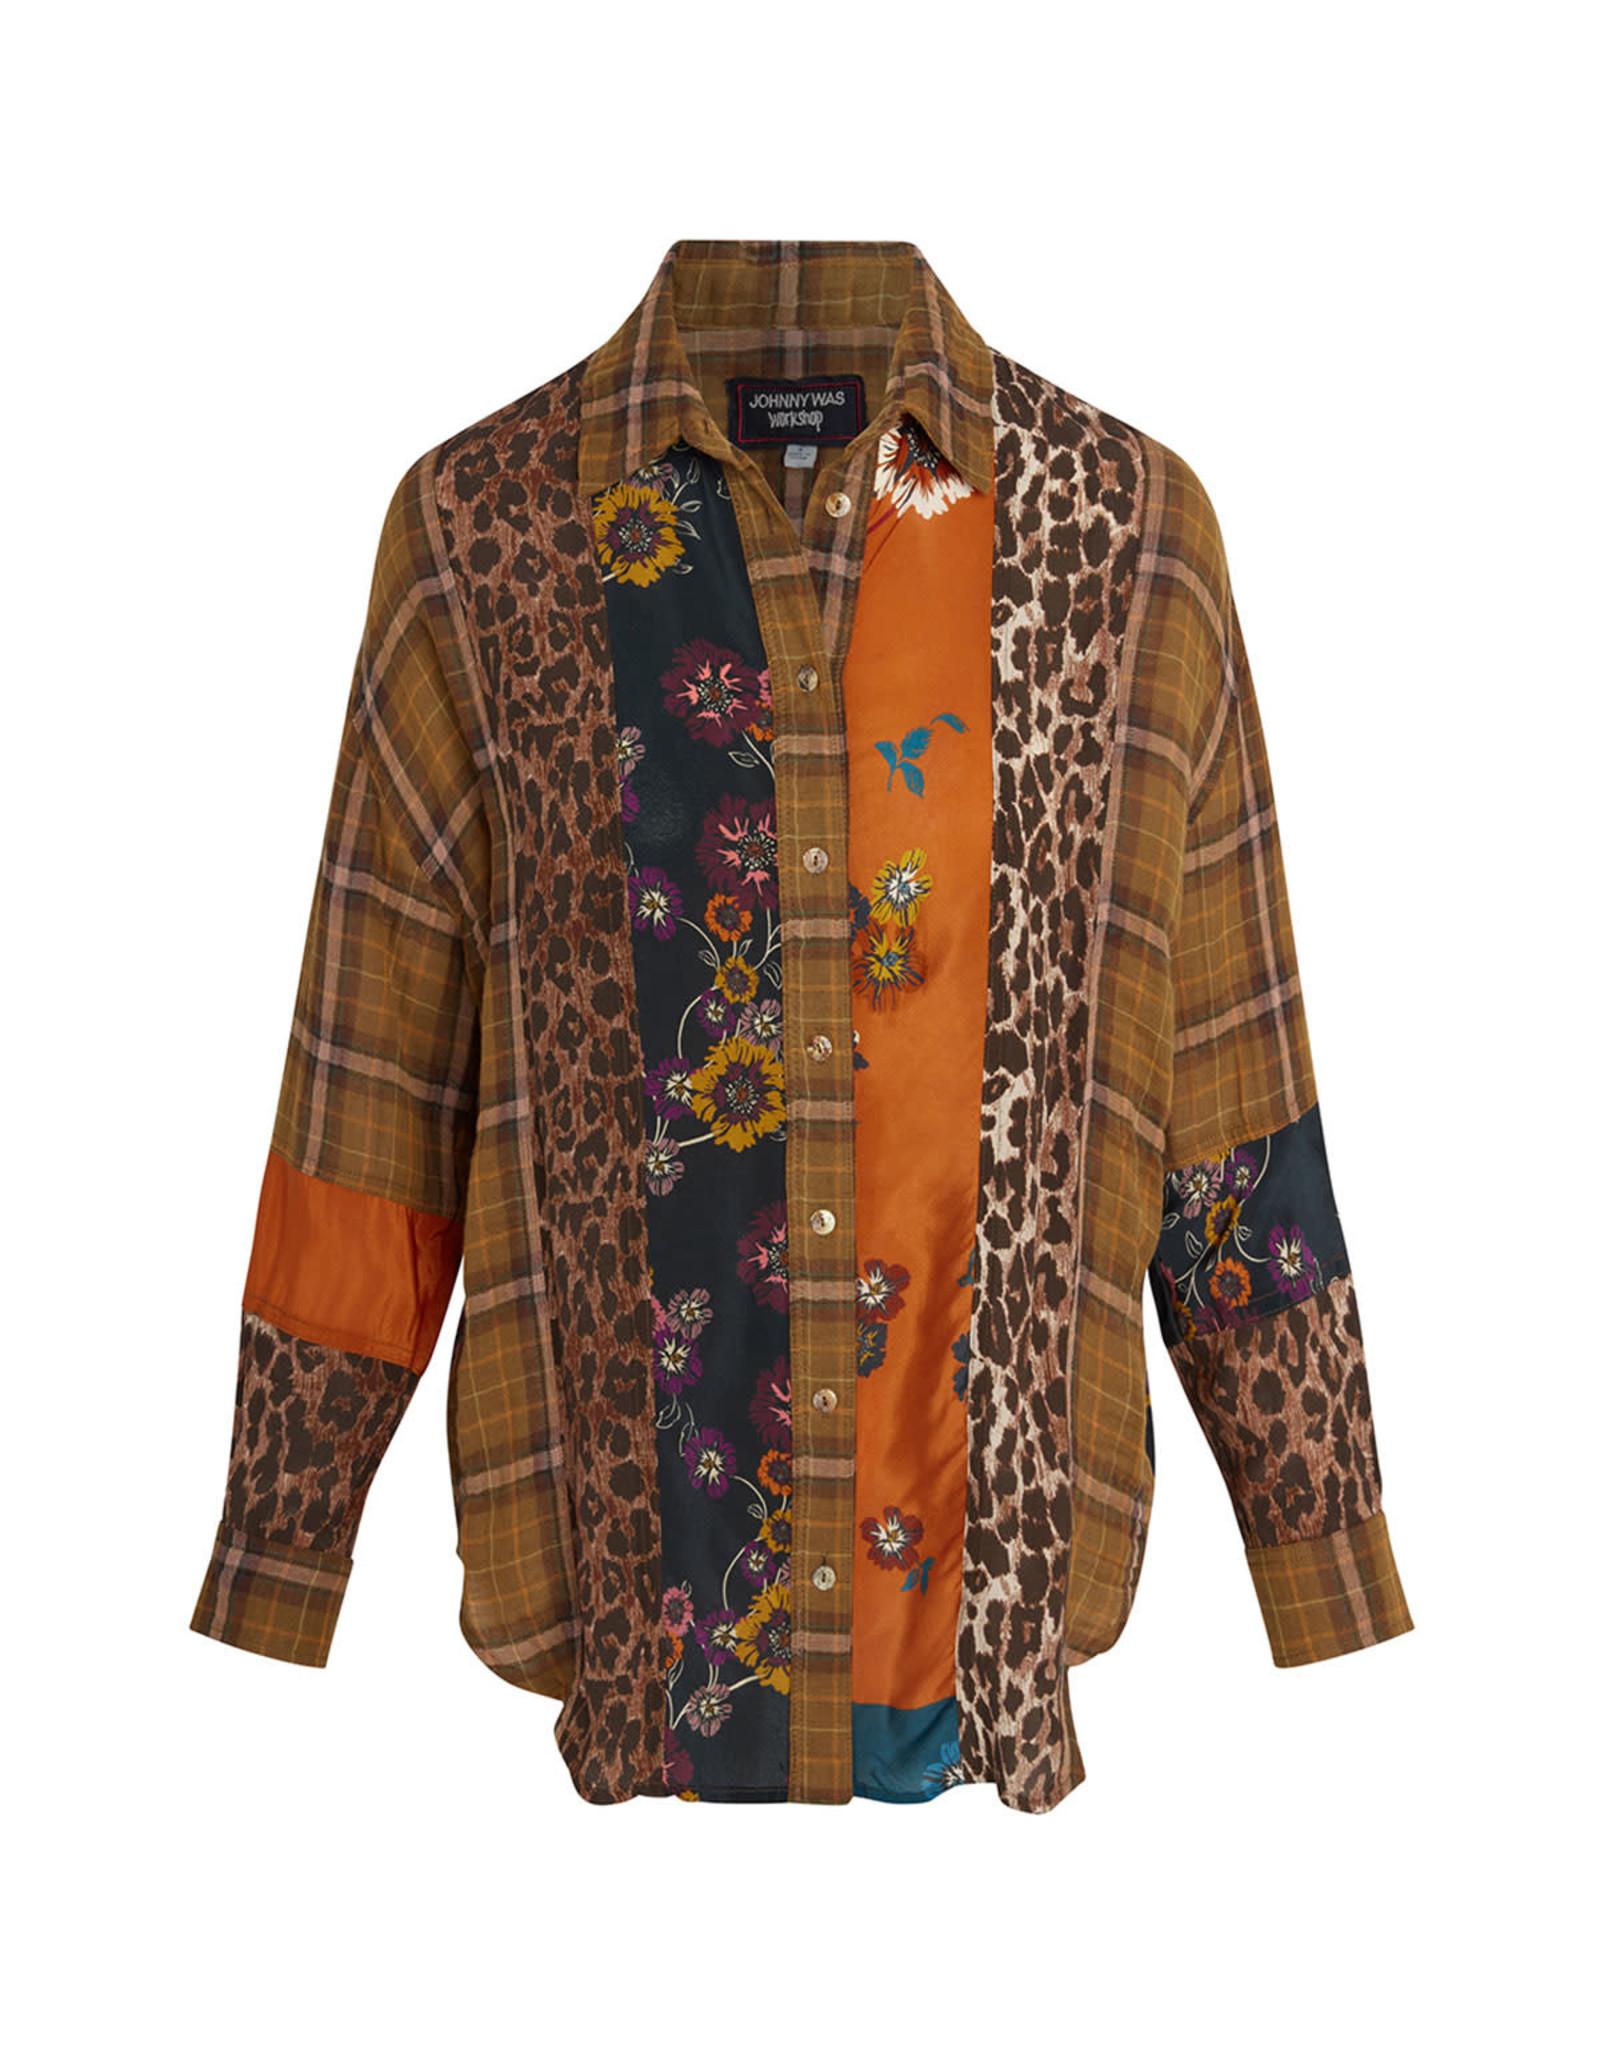 Johnny Was Johnny Was Plaid Mix Shirt